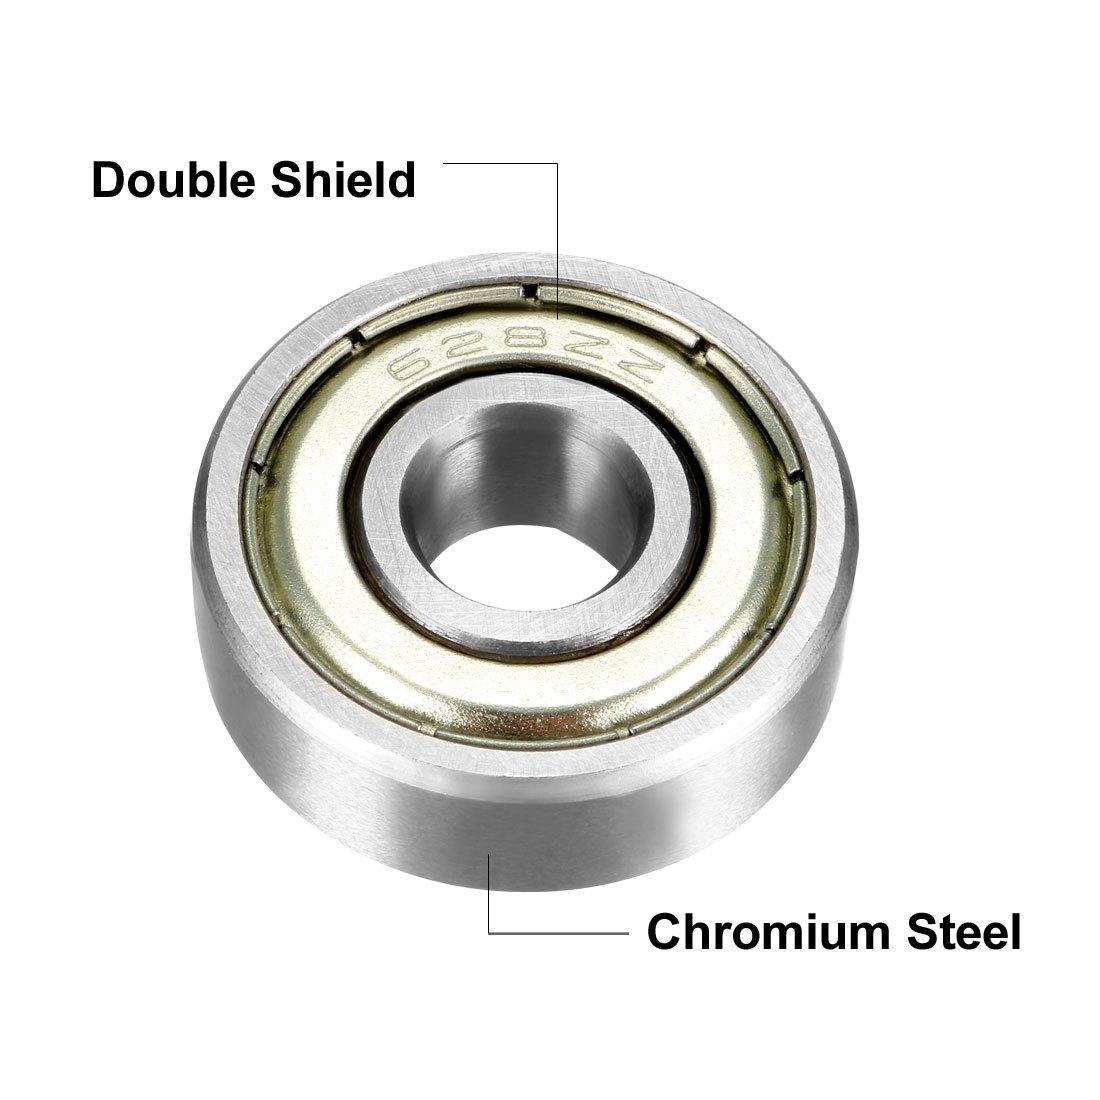 uxcell R1660ZZ Deep Groove Ball Bearings 6mm Inner Dia 16mm OD 5mm Bore Double Shielded Chrome Steel Z2 10pcs